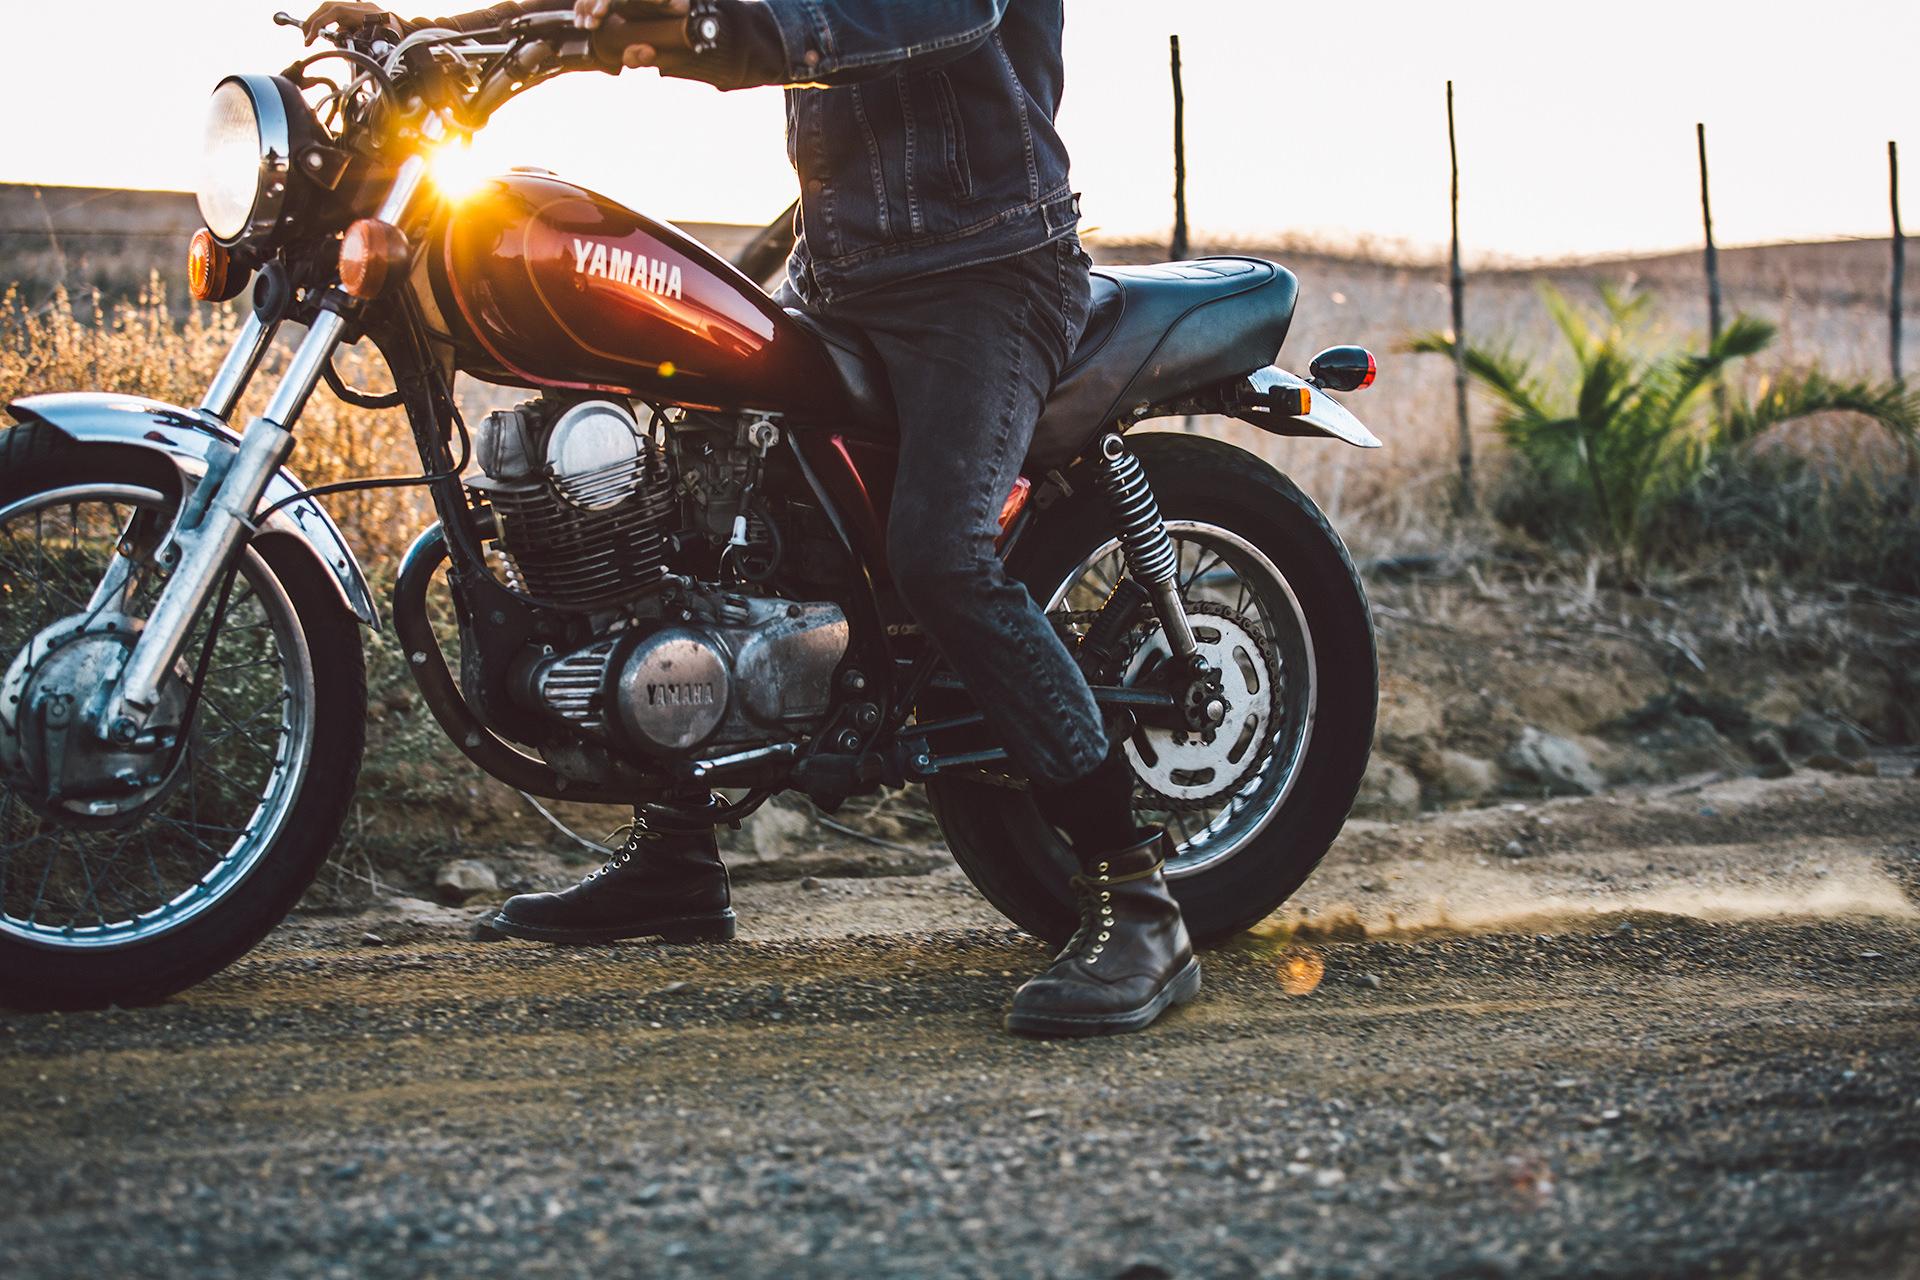 motorrad-biker-detail-strasse-yamaha